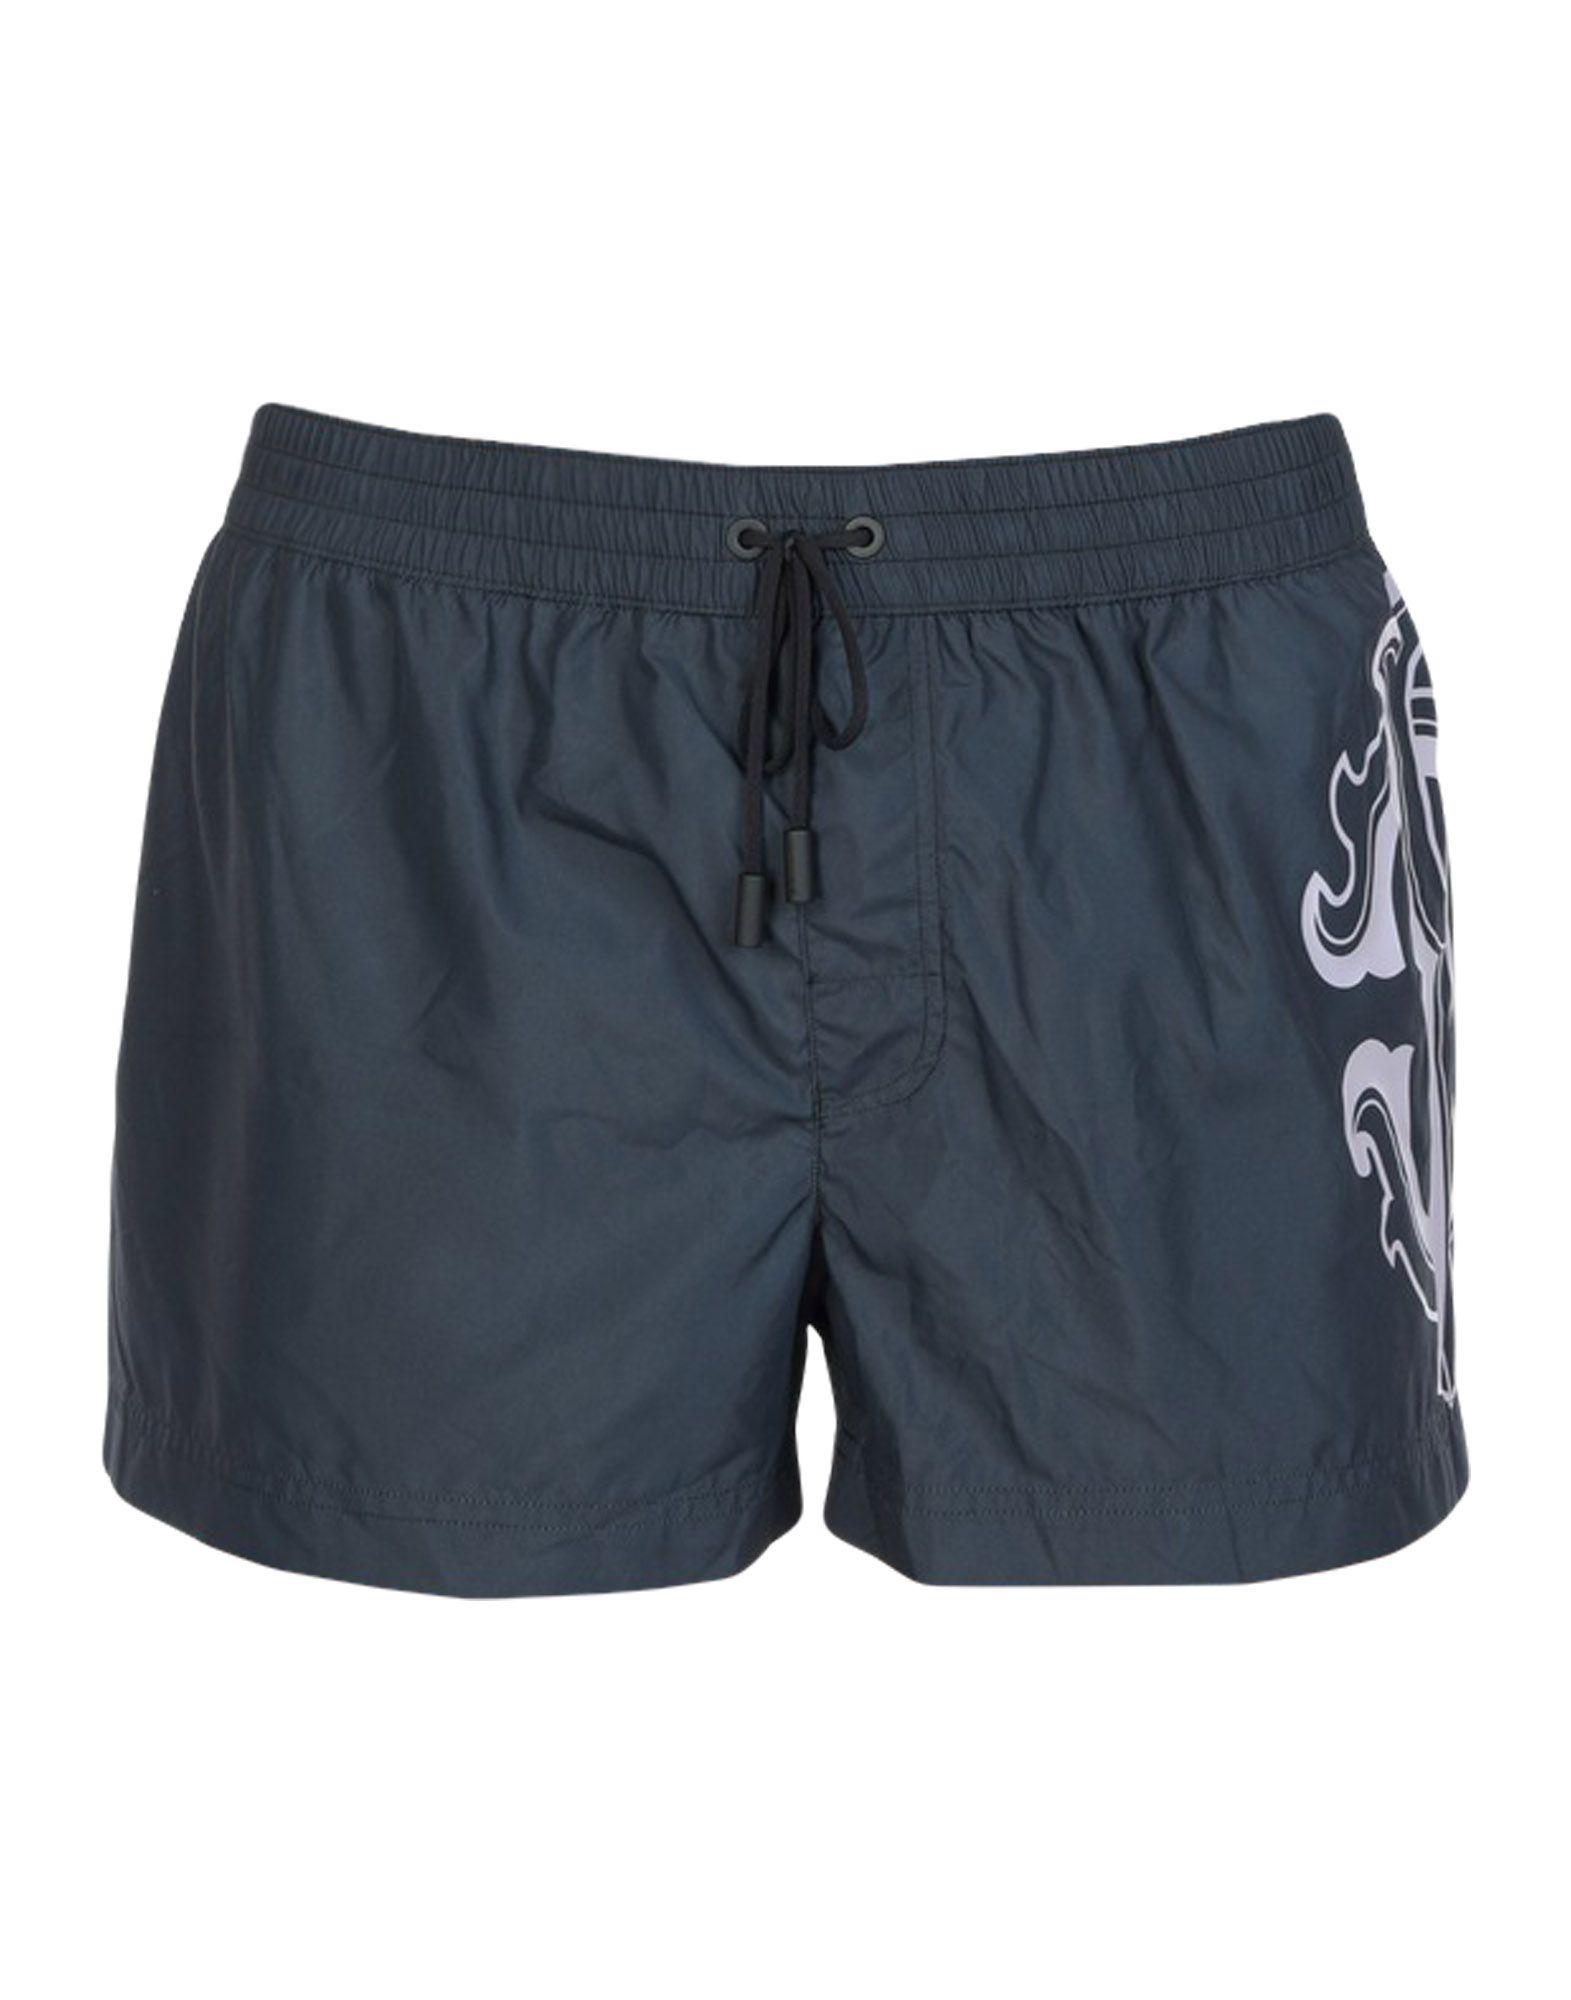 Roberto Cavalli Beachwear Swim Shorts In Black